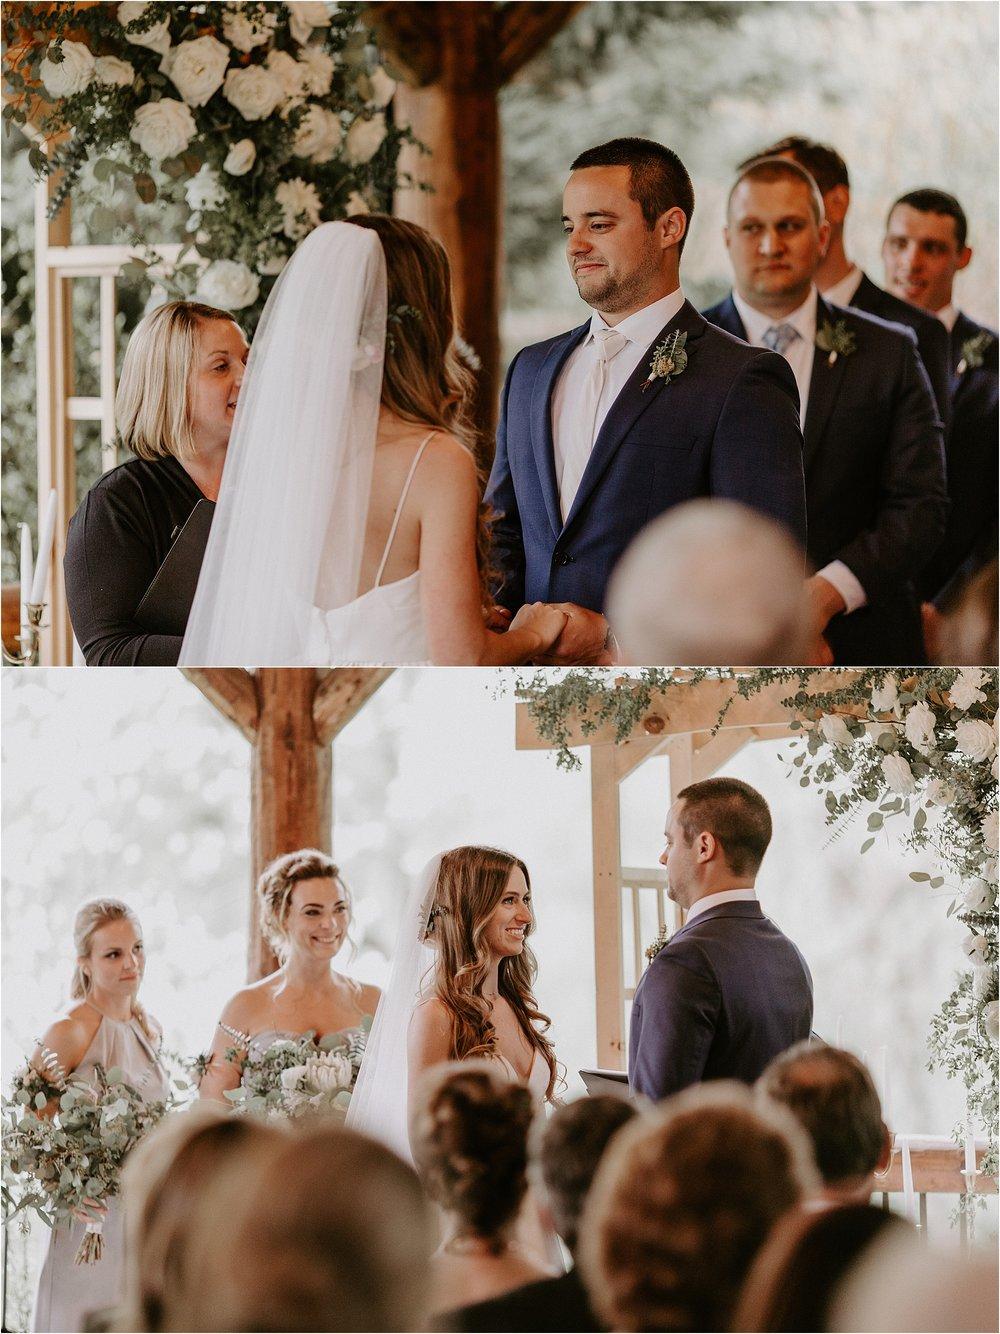 Sarah_Brookhart_Lancaster_PA_Wedding_Photographer_0050.jpg